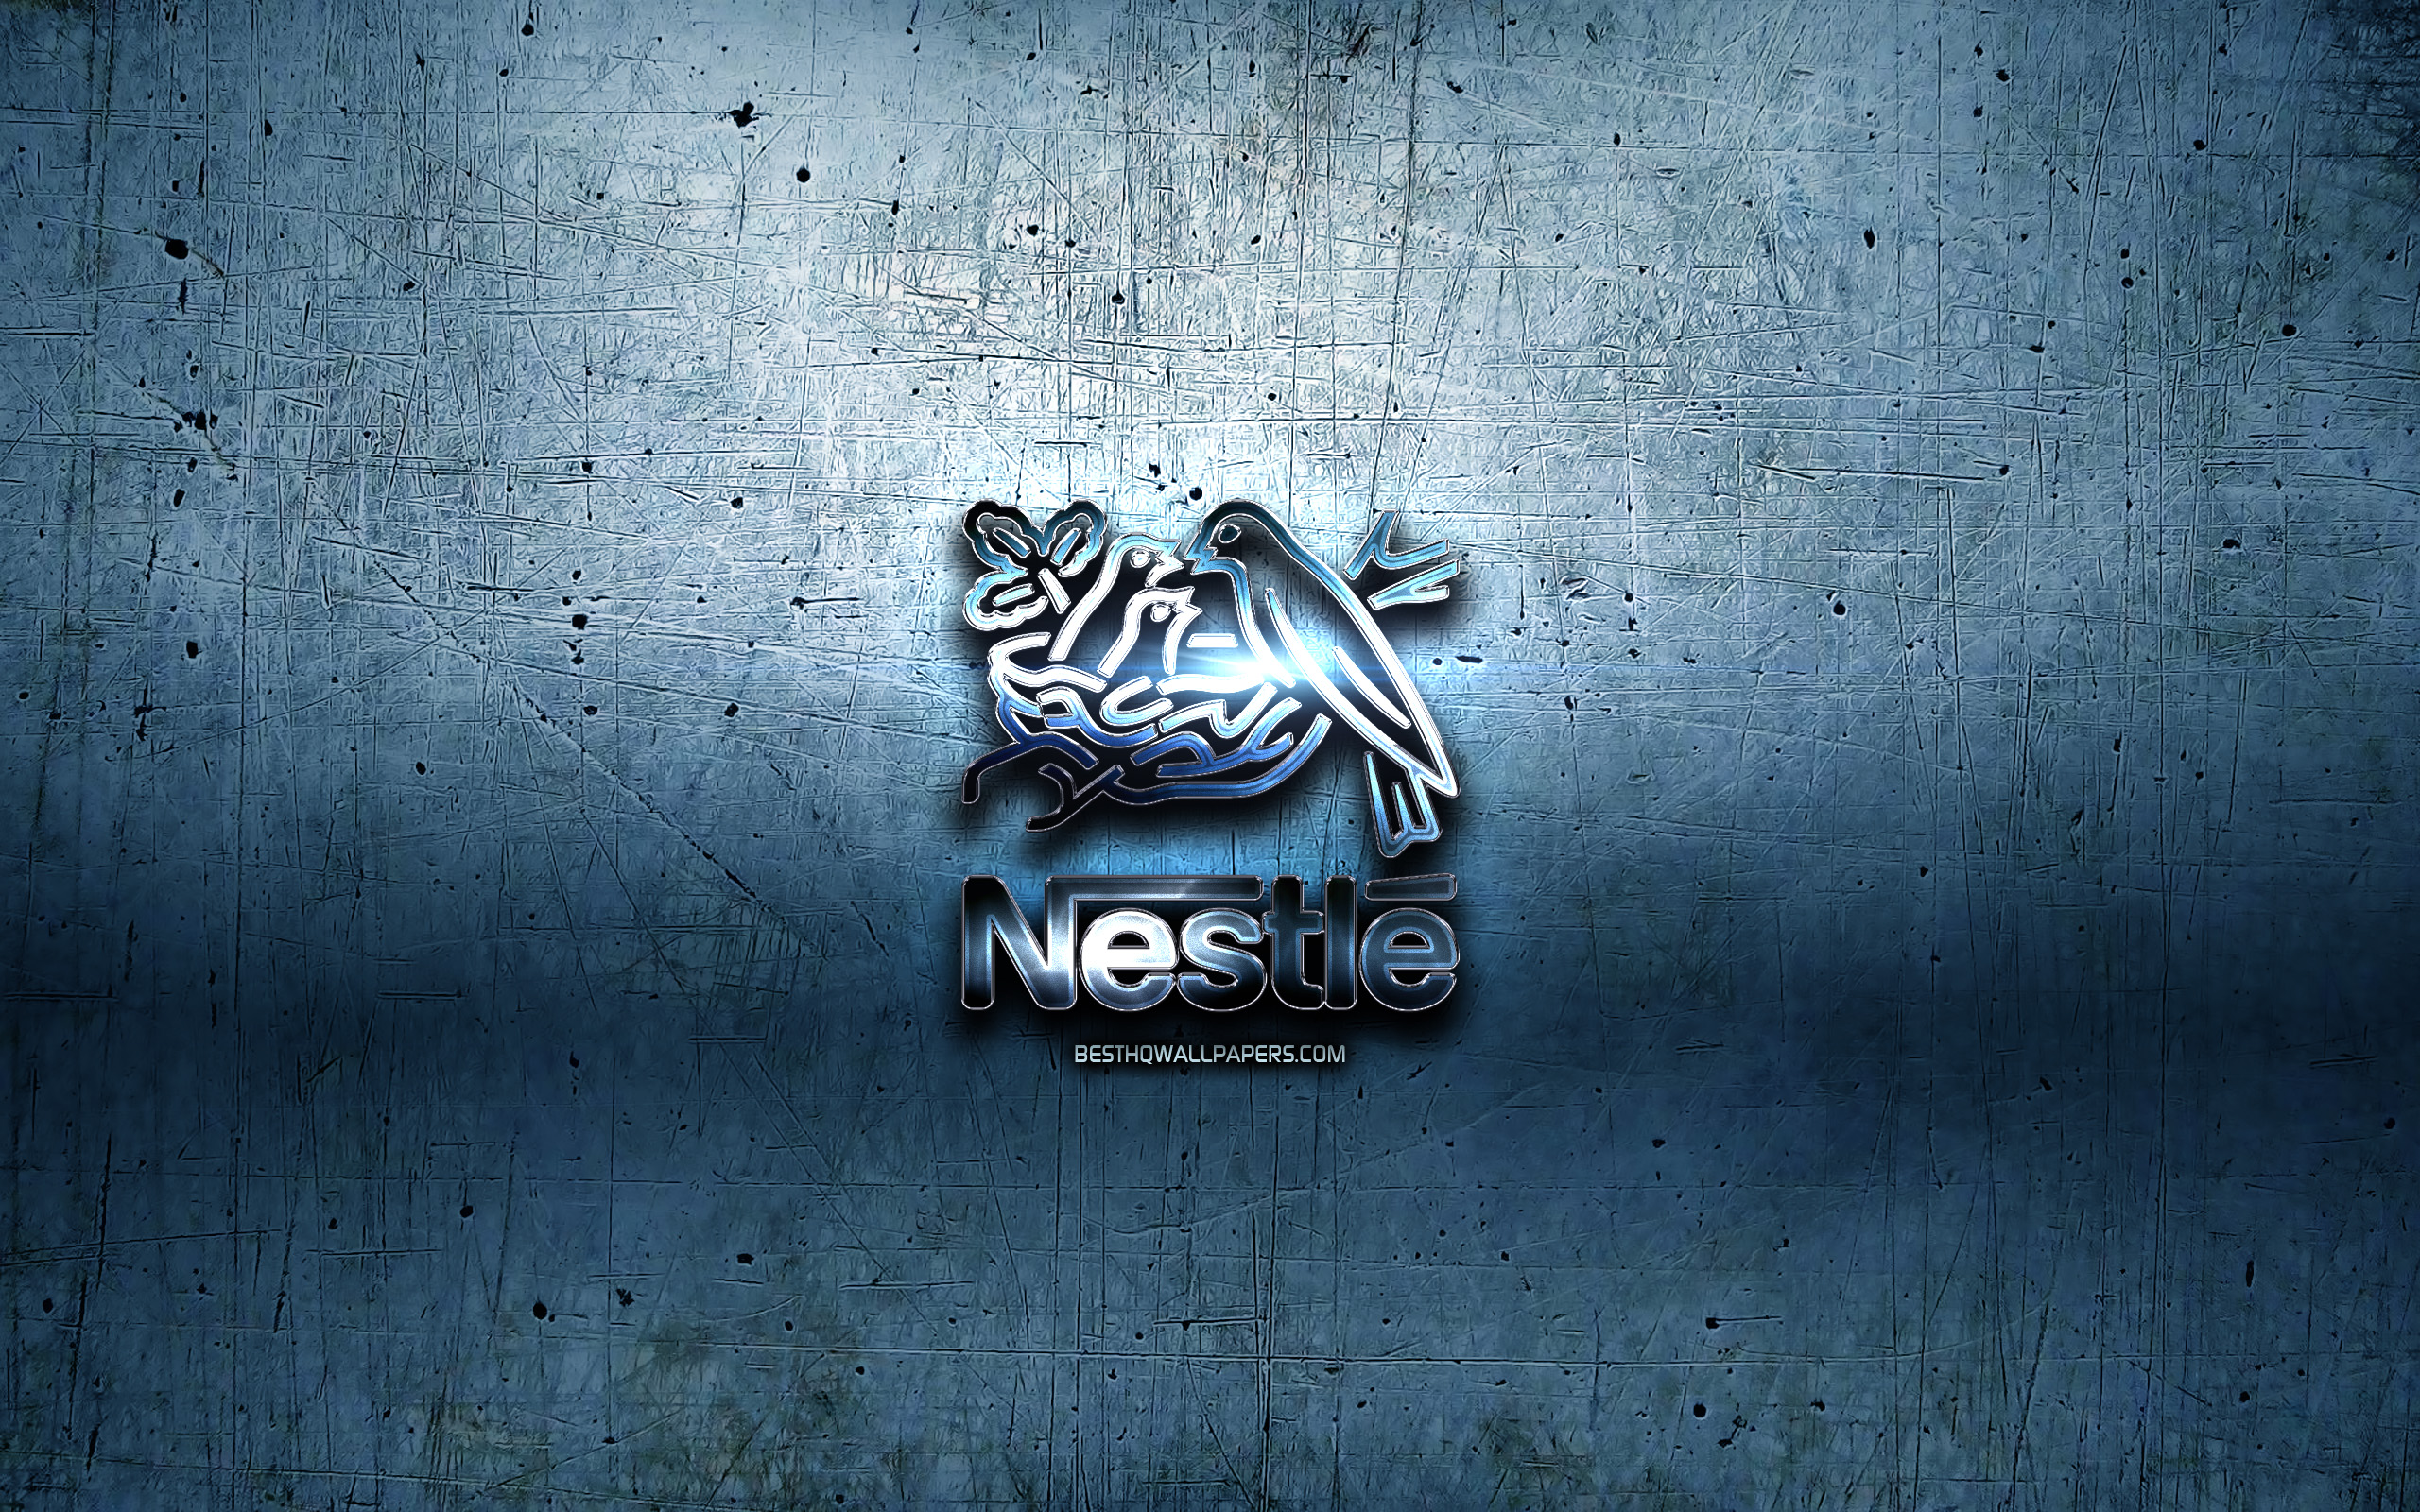 Download wallpapers Nestle metal logo blue metal background 2560x1600